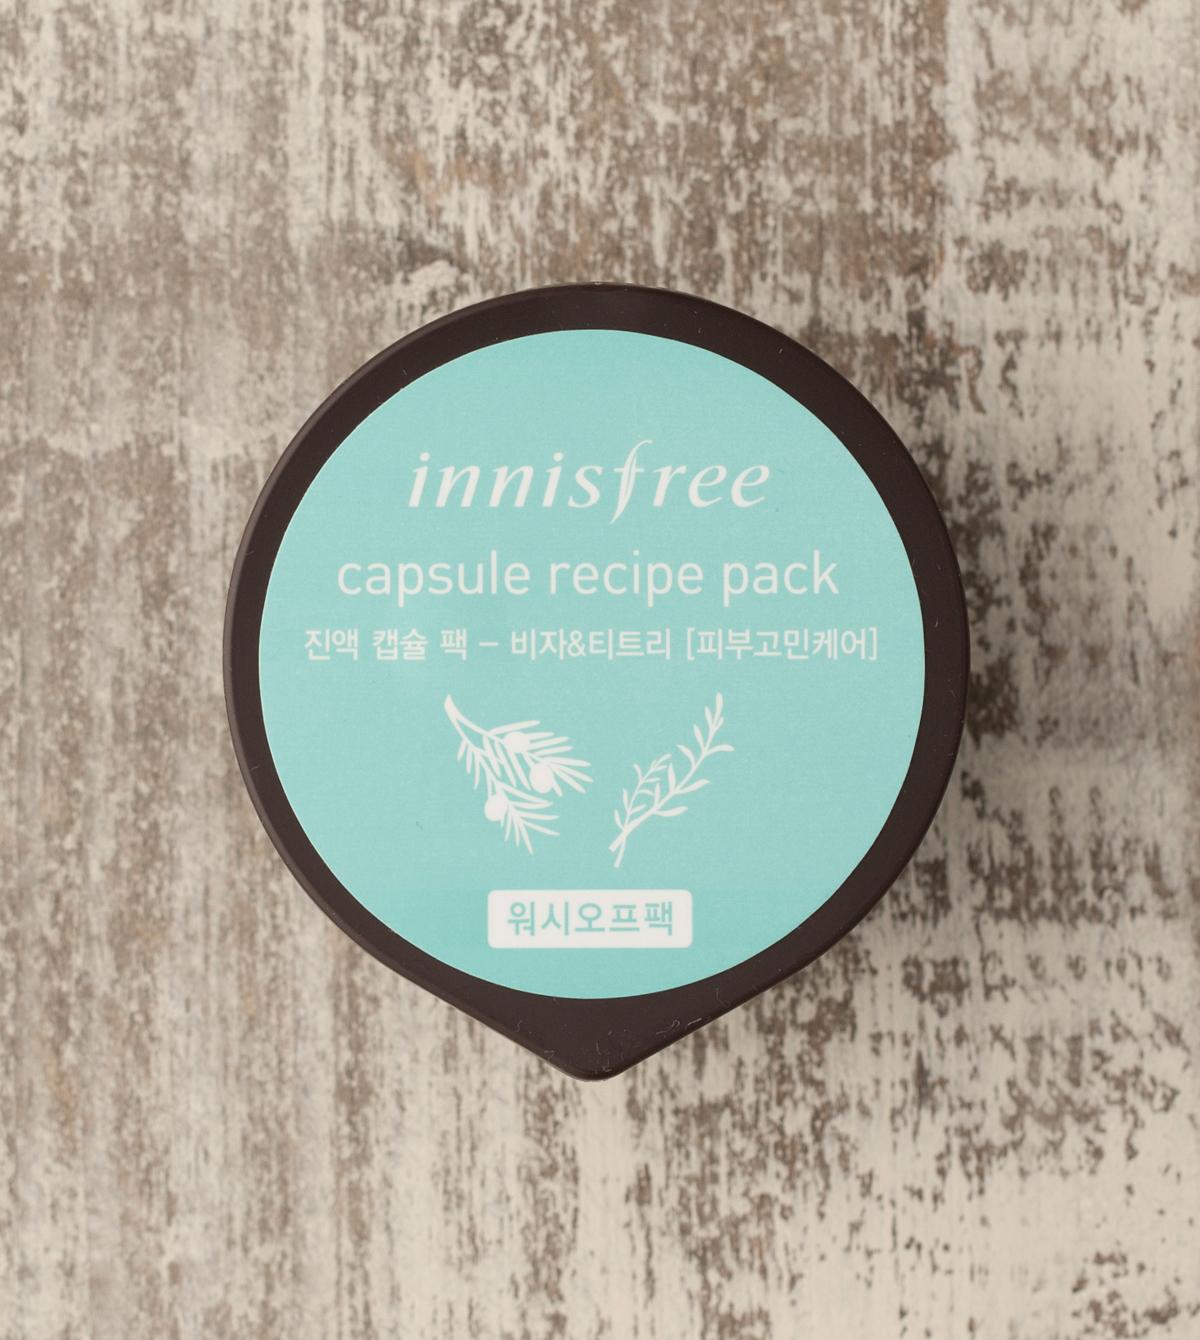 INNISFREE CAPSULE RECIPE PACK-bija & tea tree